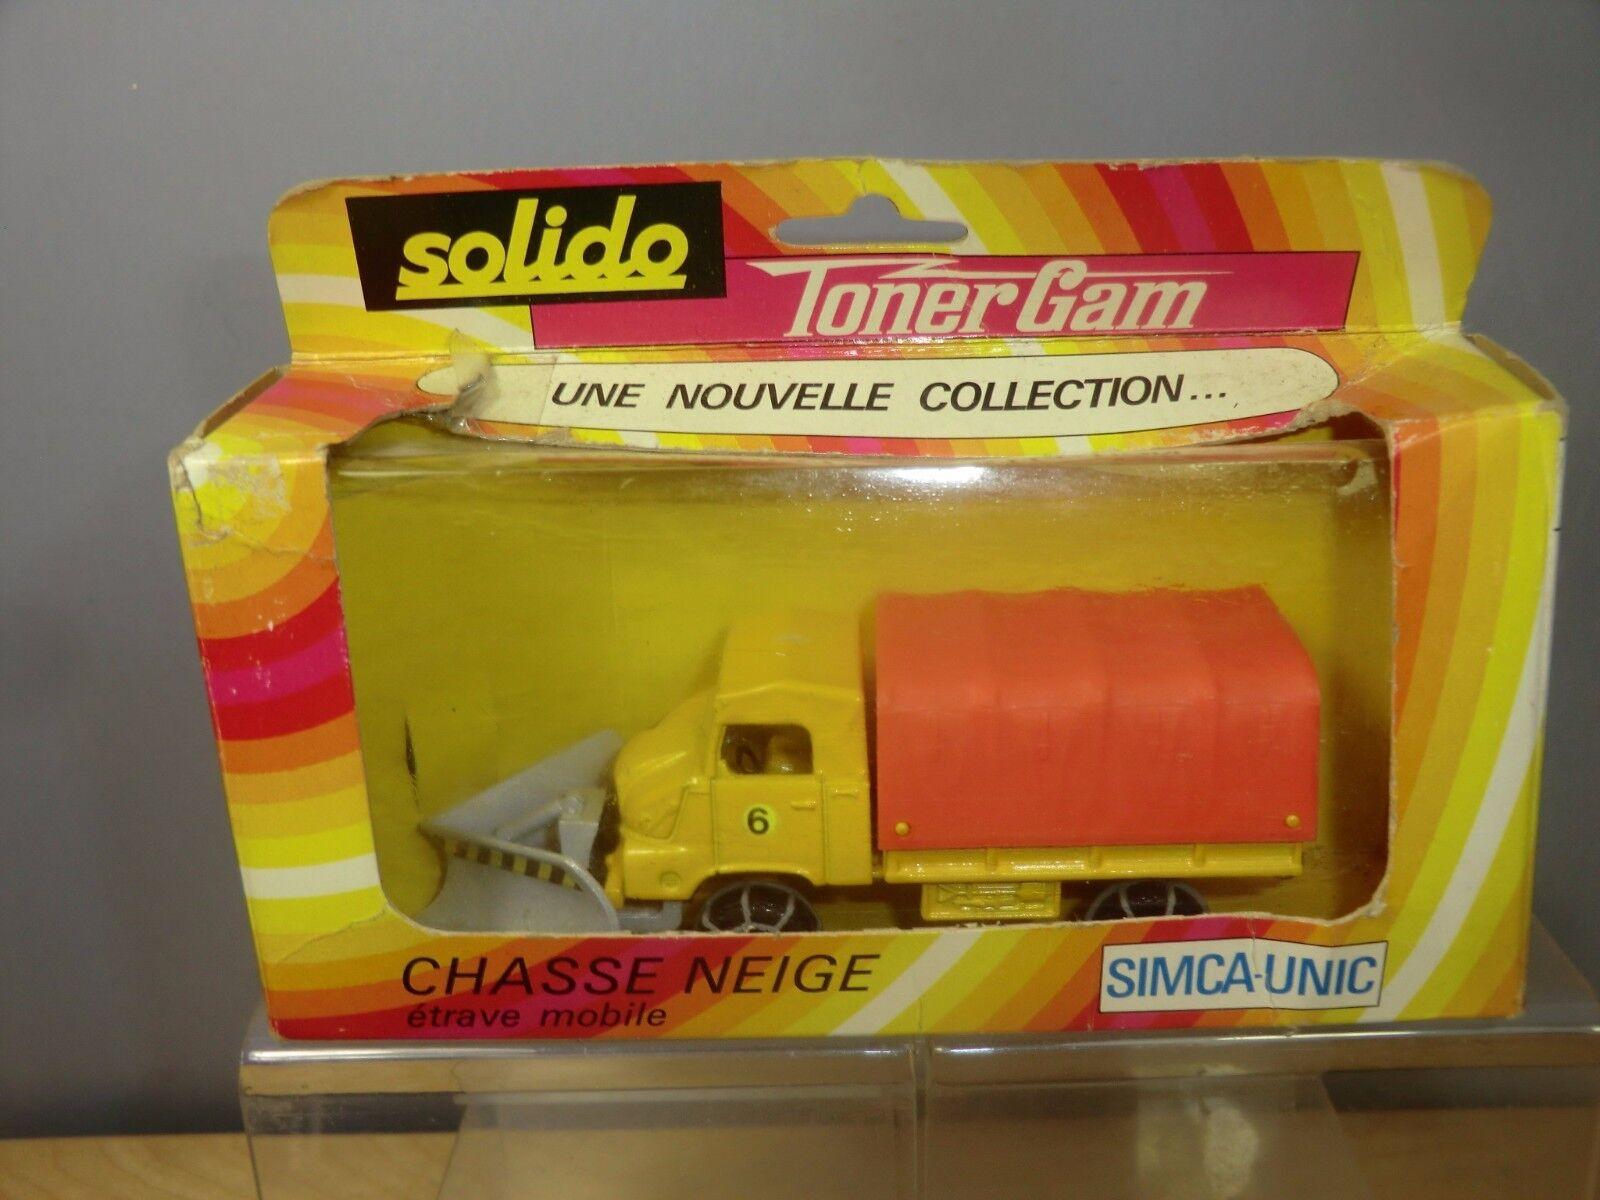 VINTAGE SOLIDO   MODEL No.359  TONER GAM    SIMCA.UNIC SNOW PLOUGH  .VN MIB